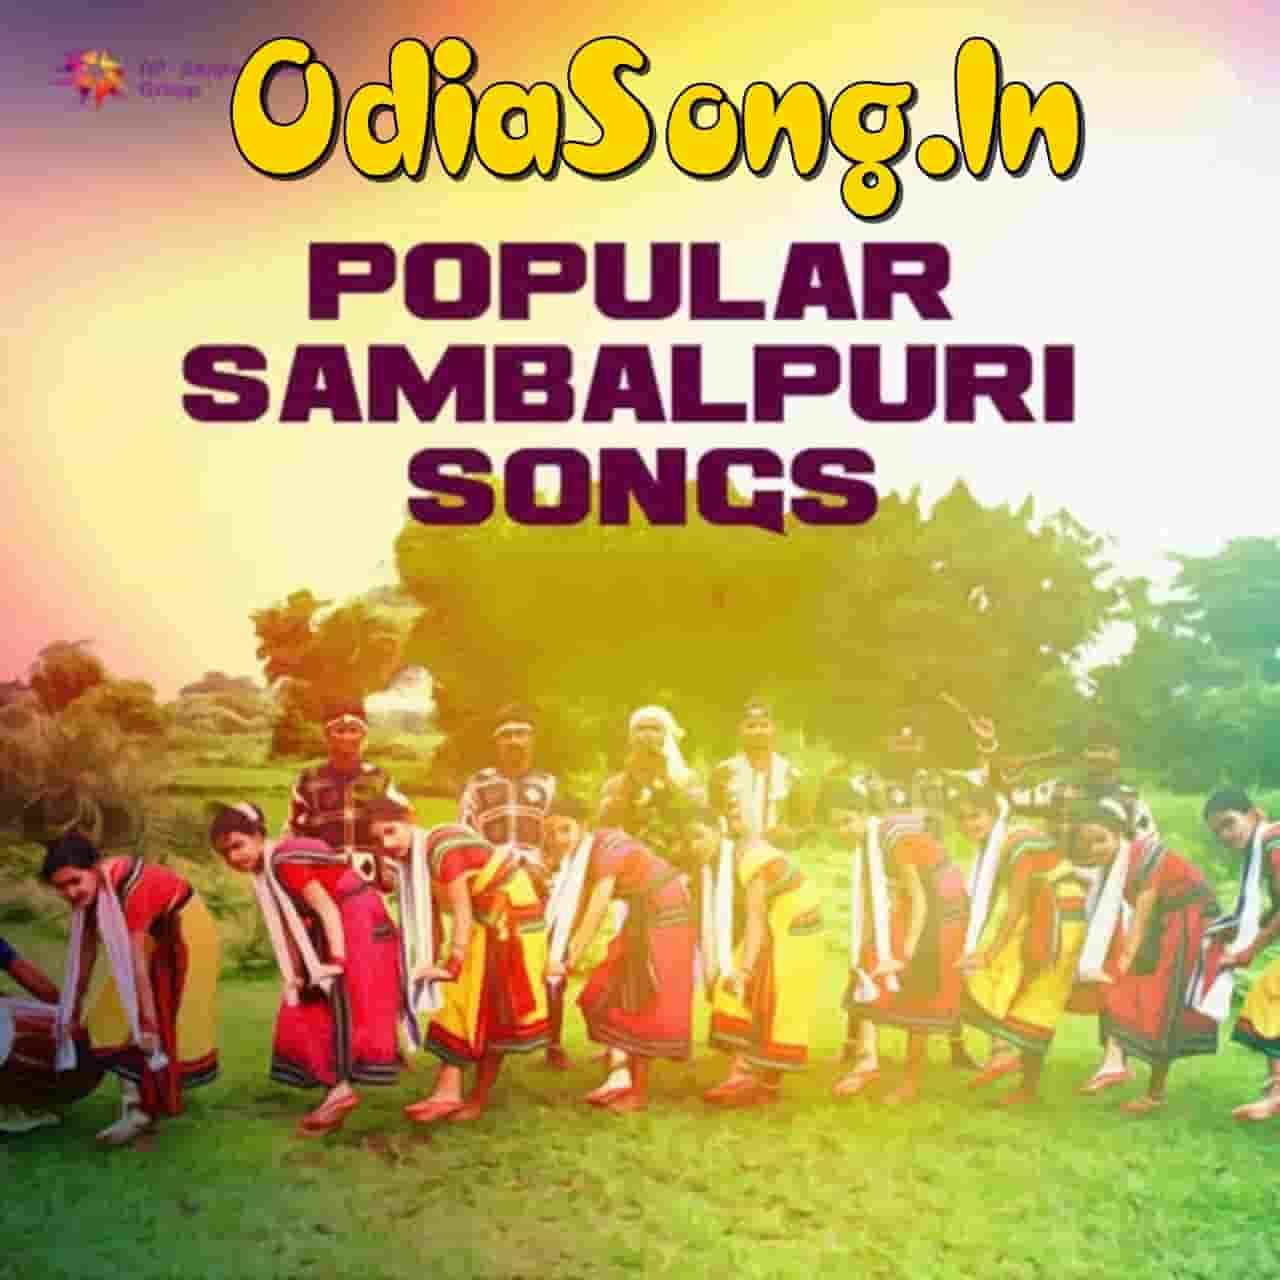 Selfie Wala Dance - New Sambalpuri Song By Jugal Bhoi